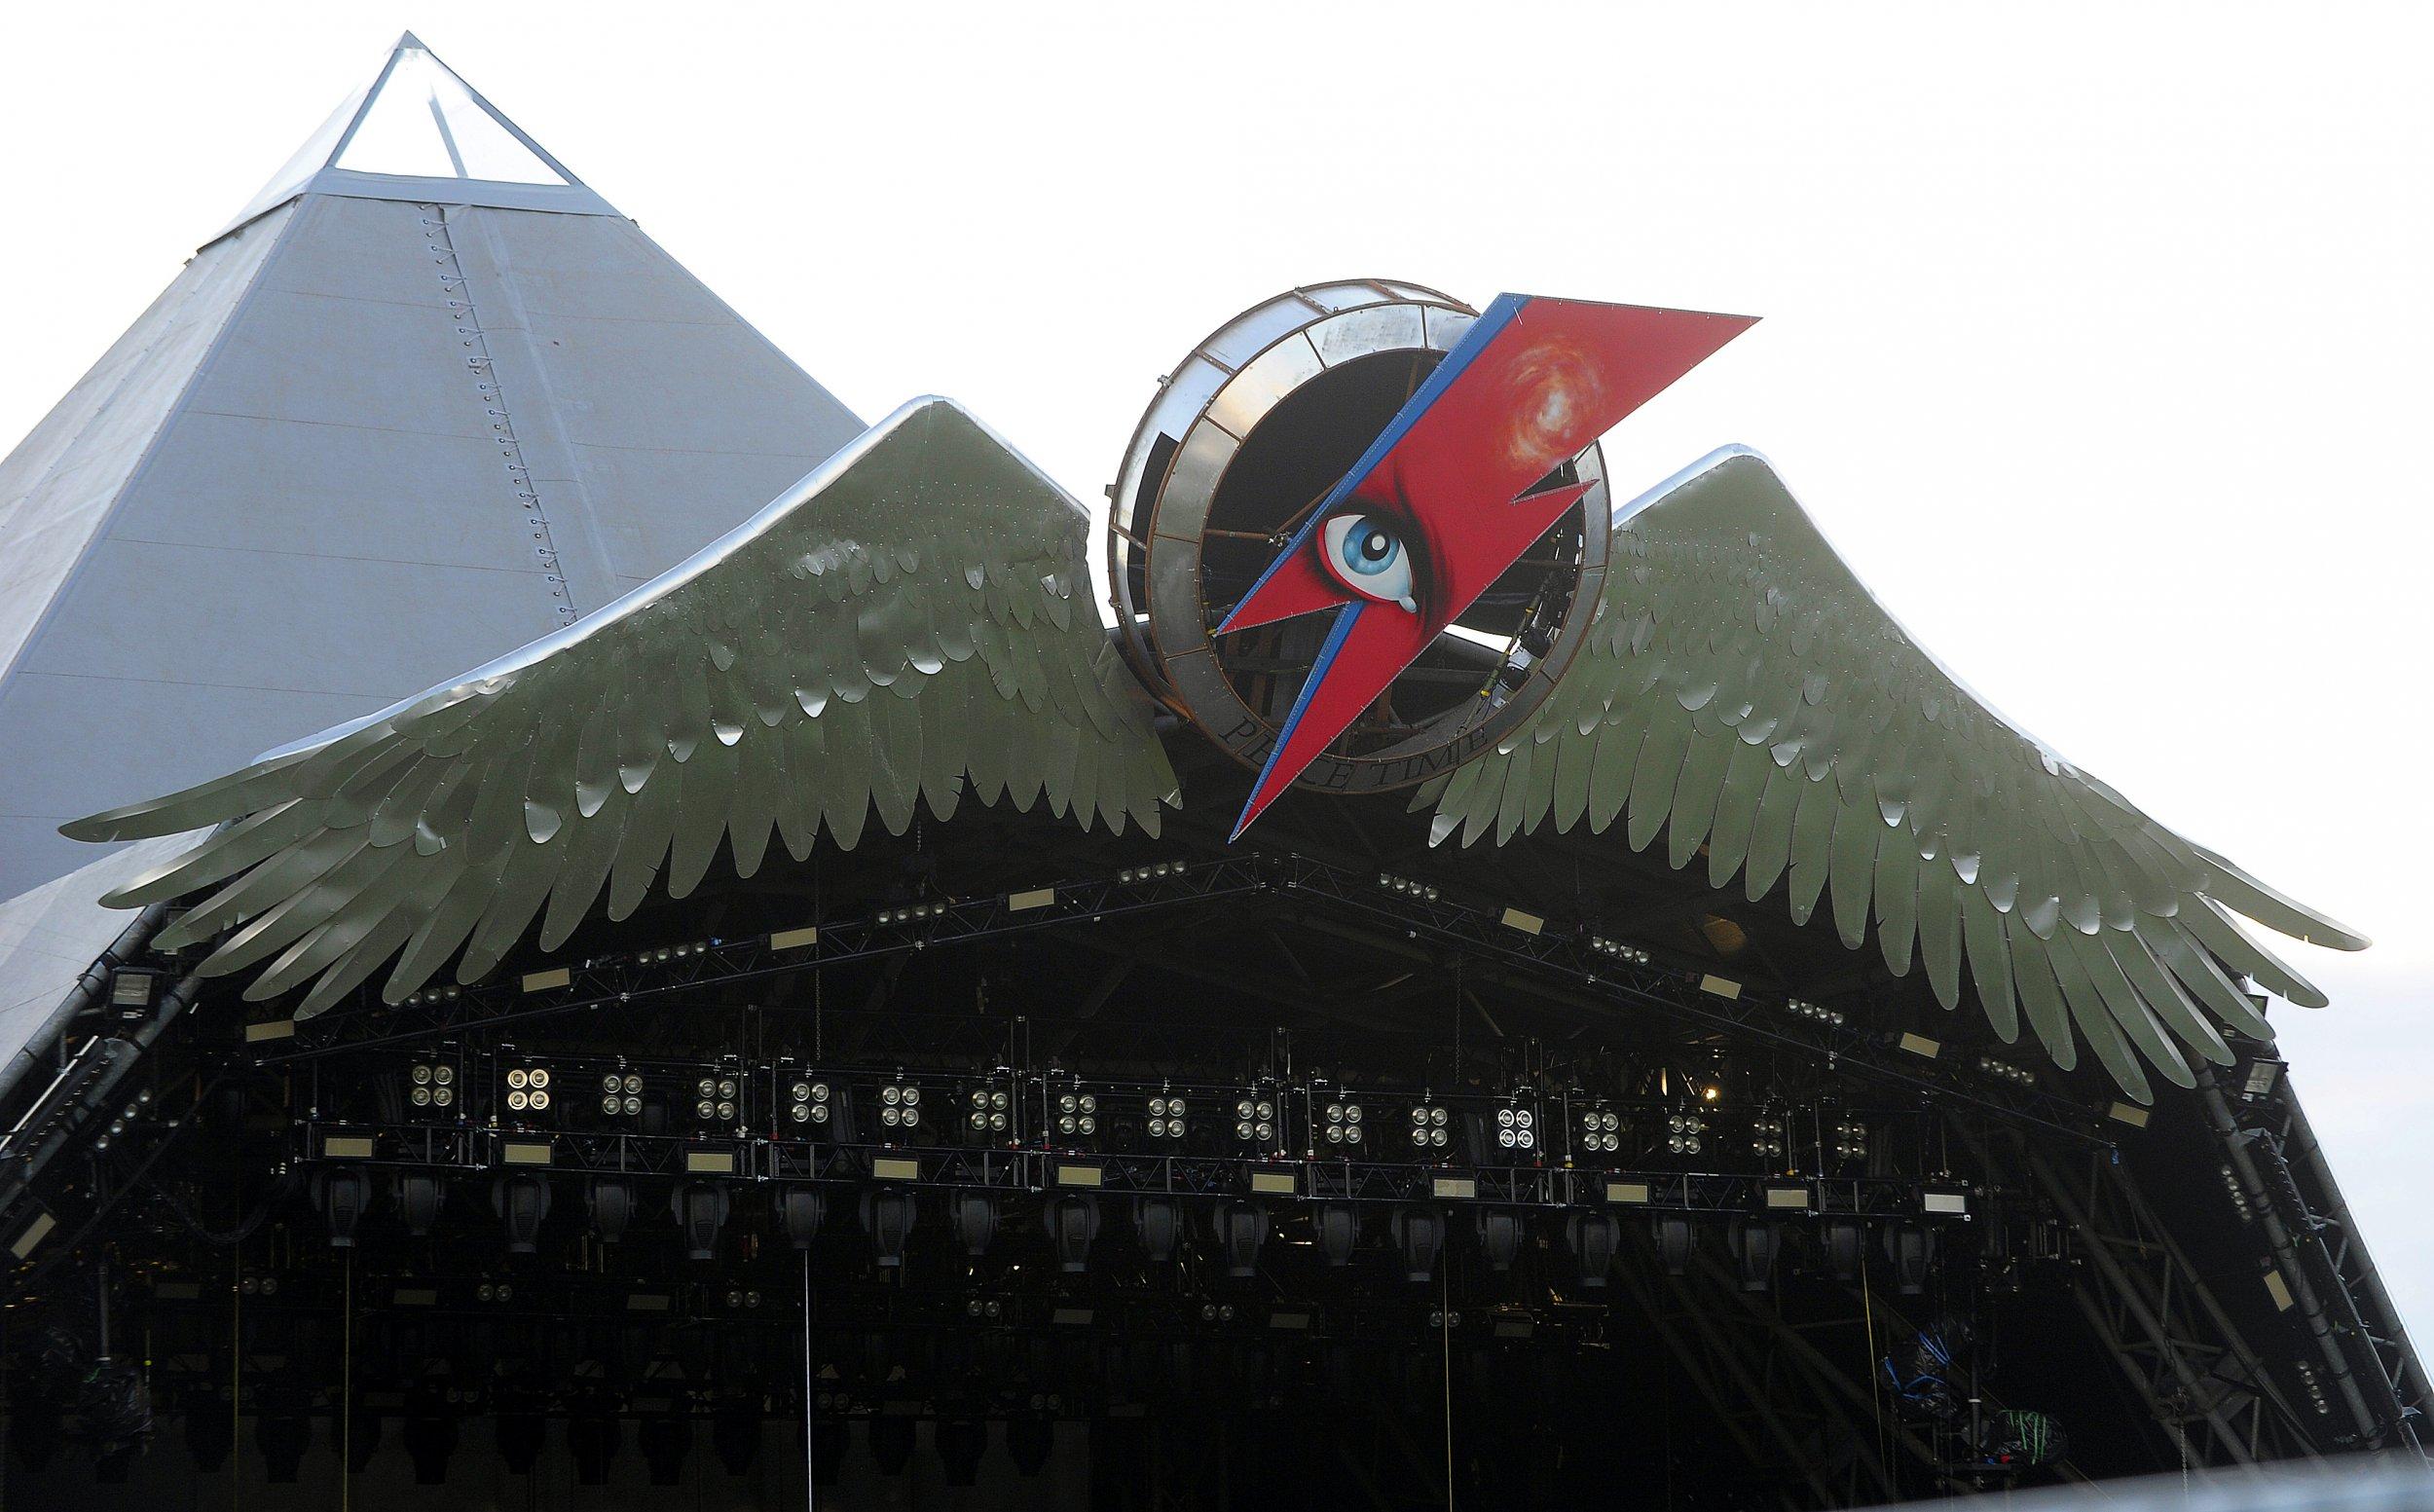 David Bowie Pyramid stage at Glastonbury